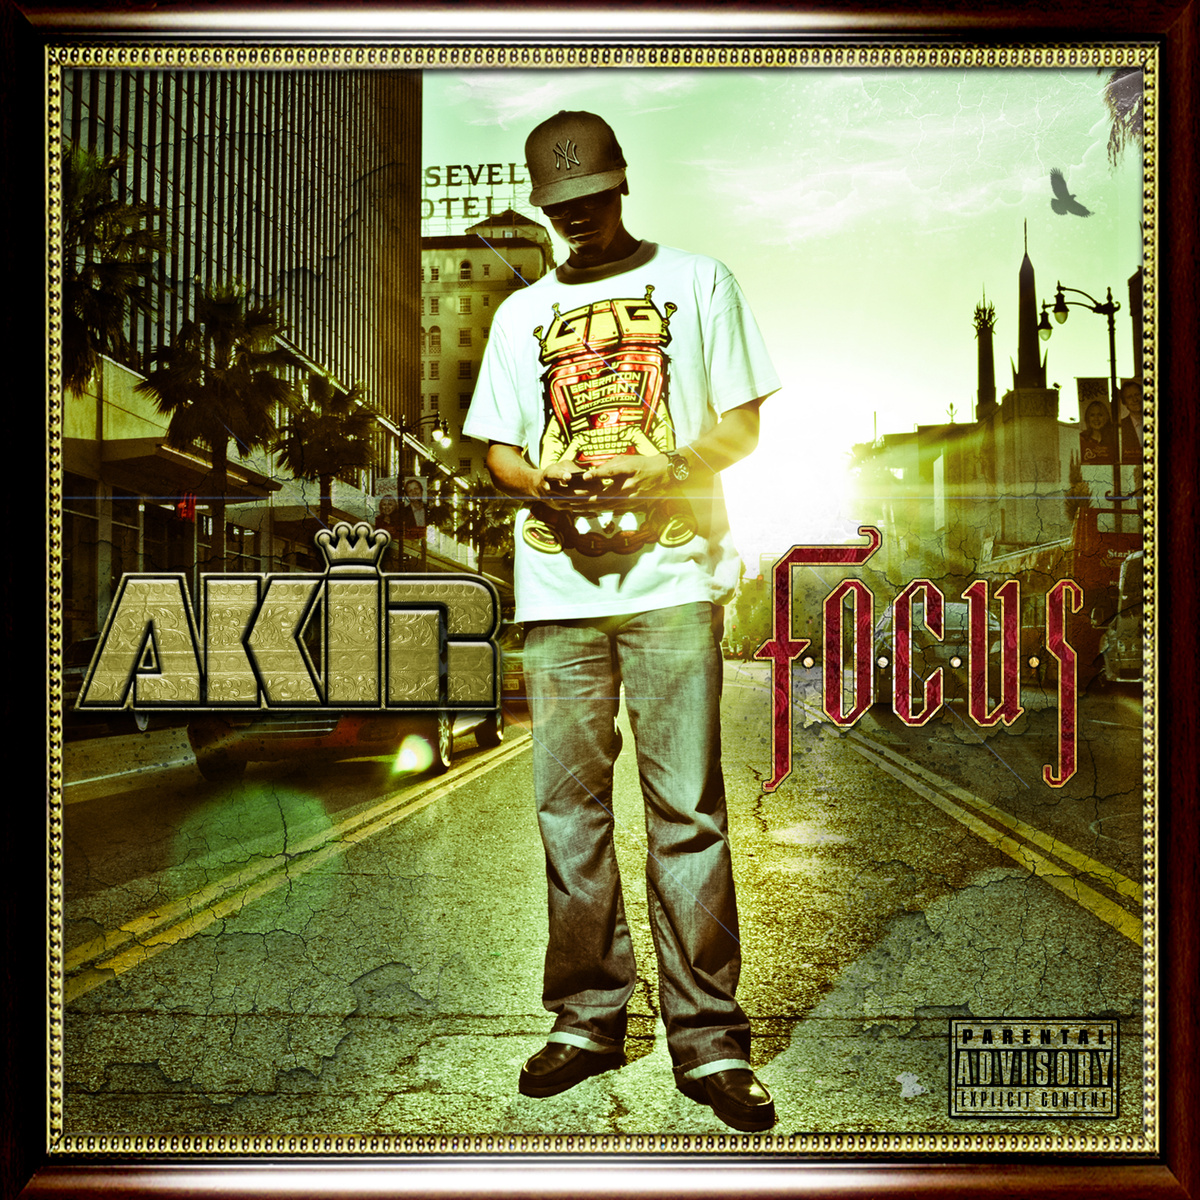 Akir Focus EP